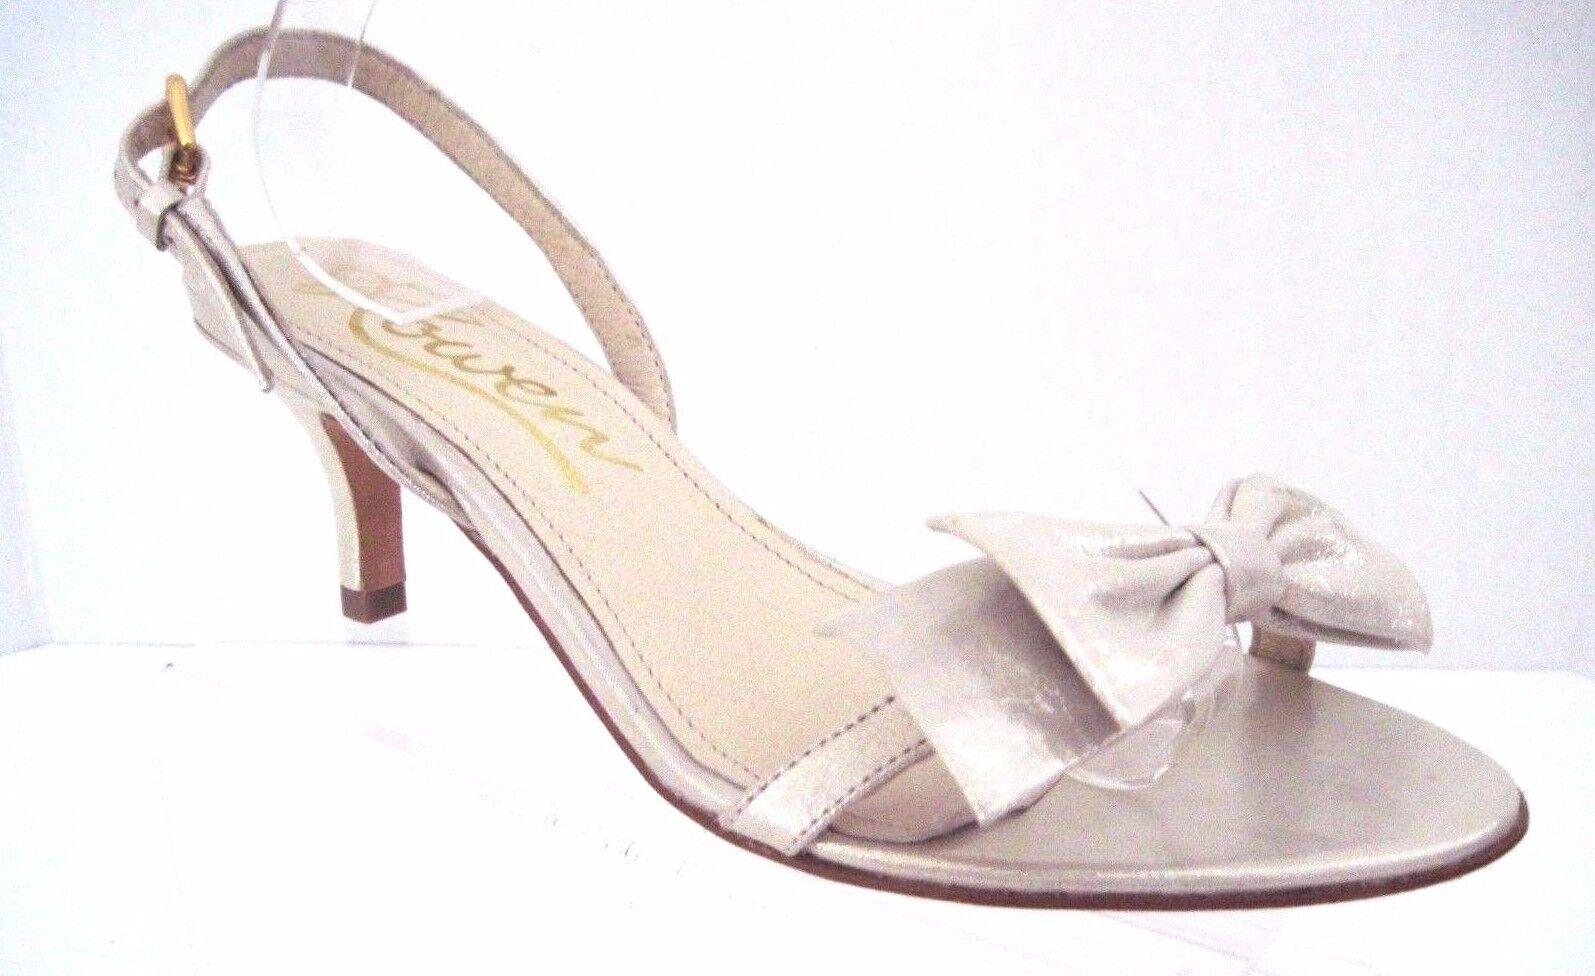 ROWEN Metallic Champagne Slingback Kitten Heels with Bow Size 8 M